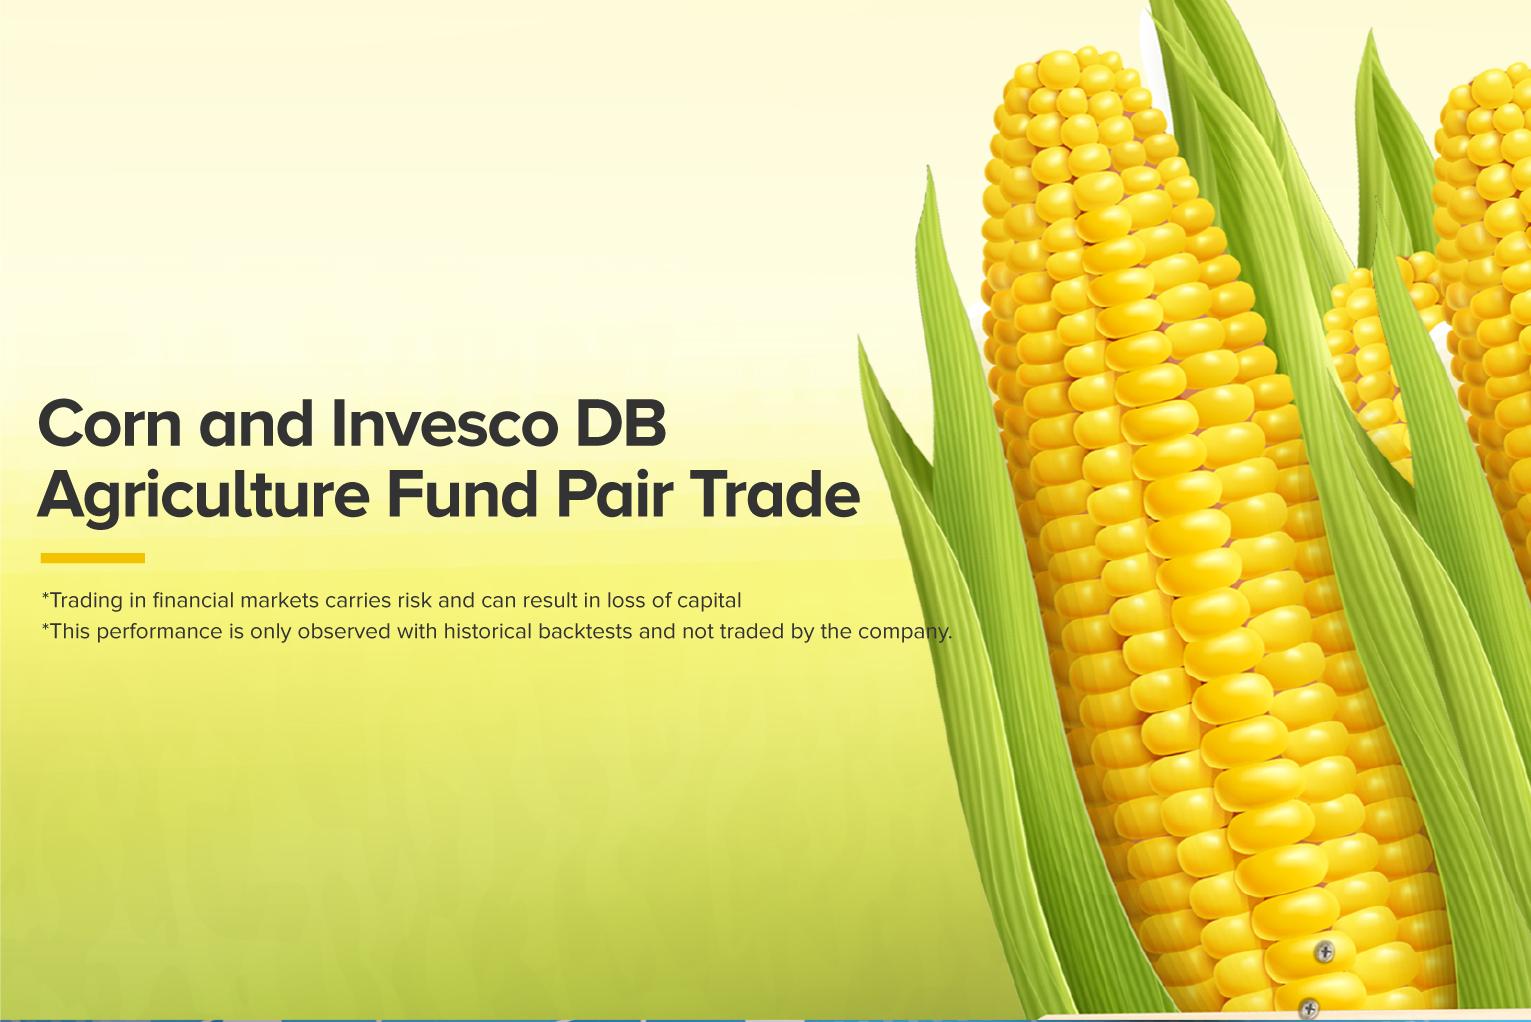 Corn & Invesco DB Agriculture Fund Pair Trade